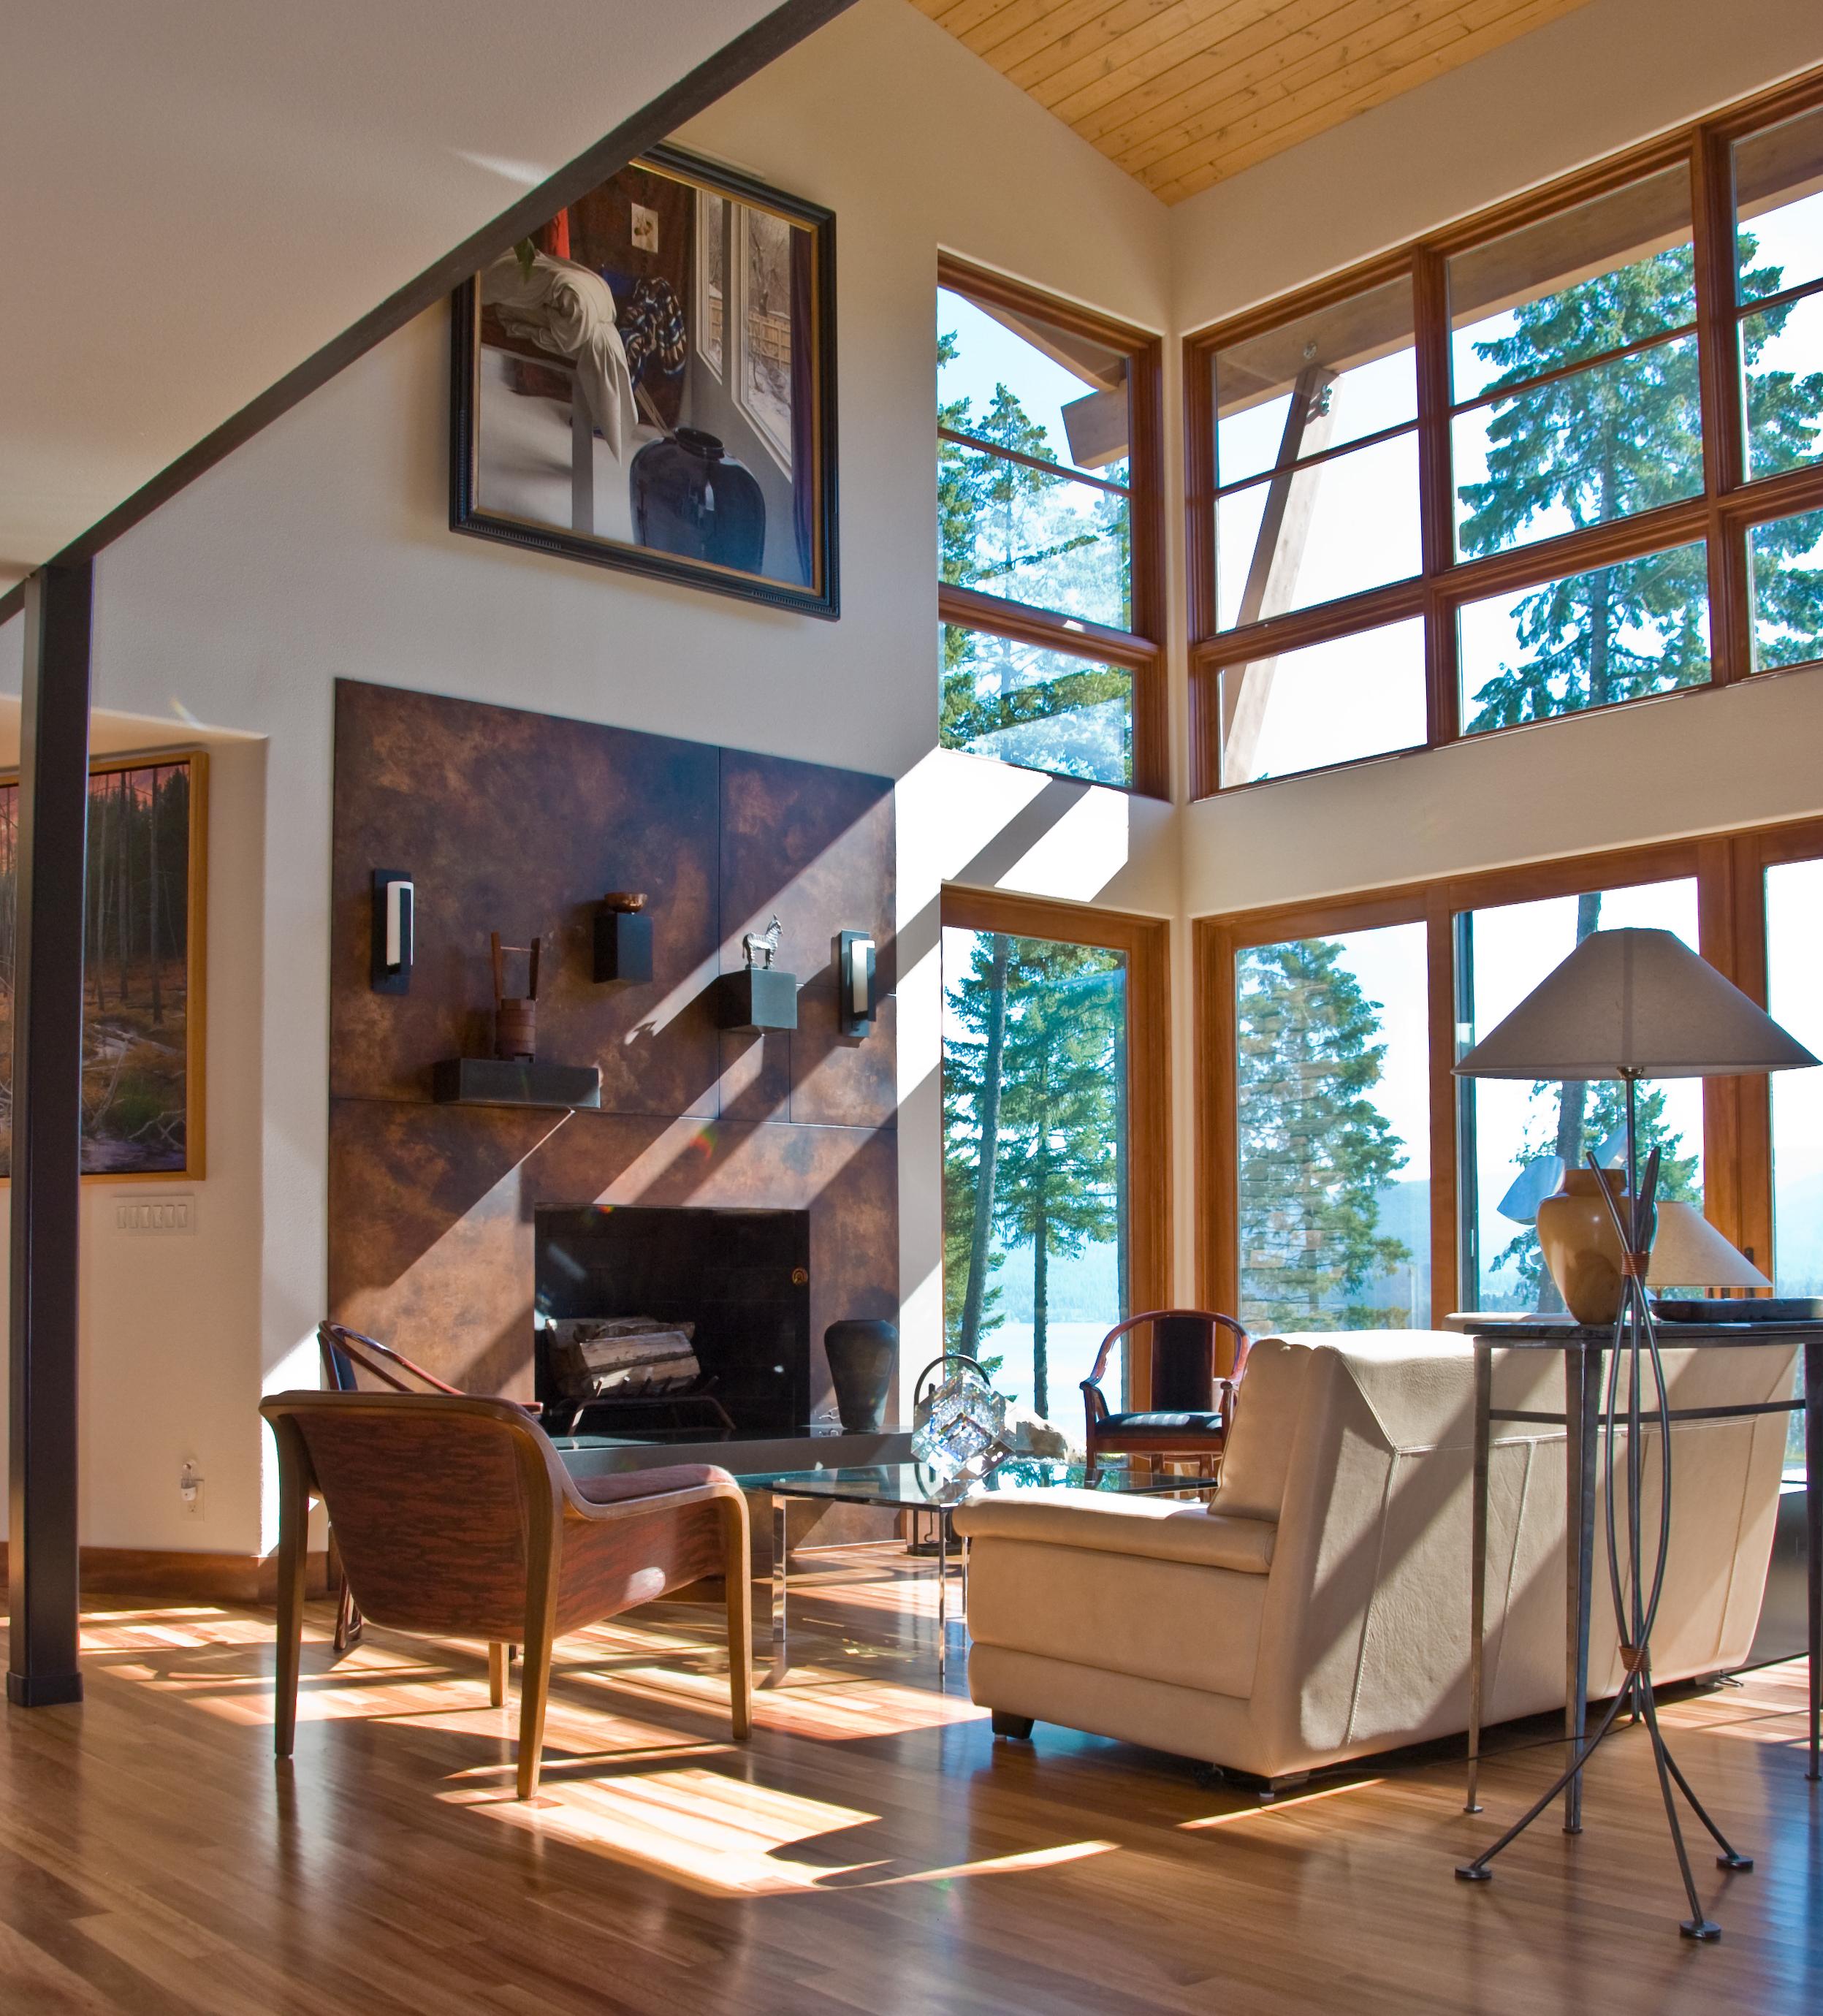 Fokes-Montgomery Residence Interior